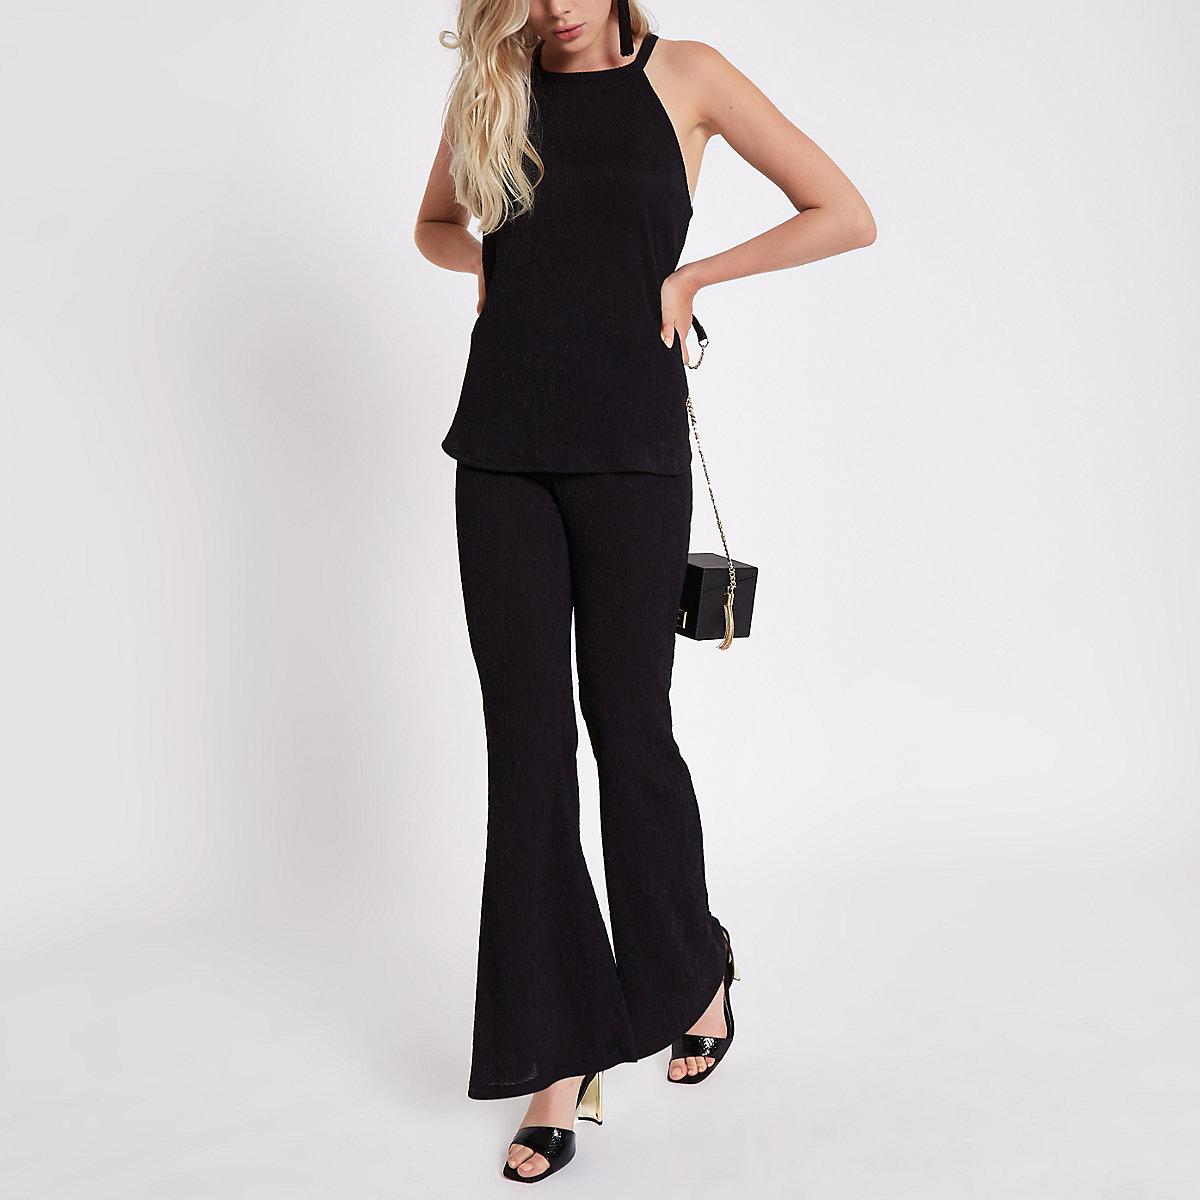 Schwarze, strukturierte Hose